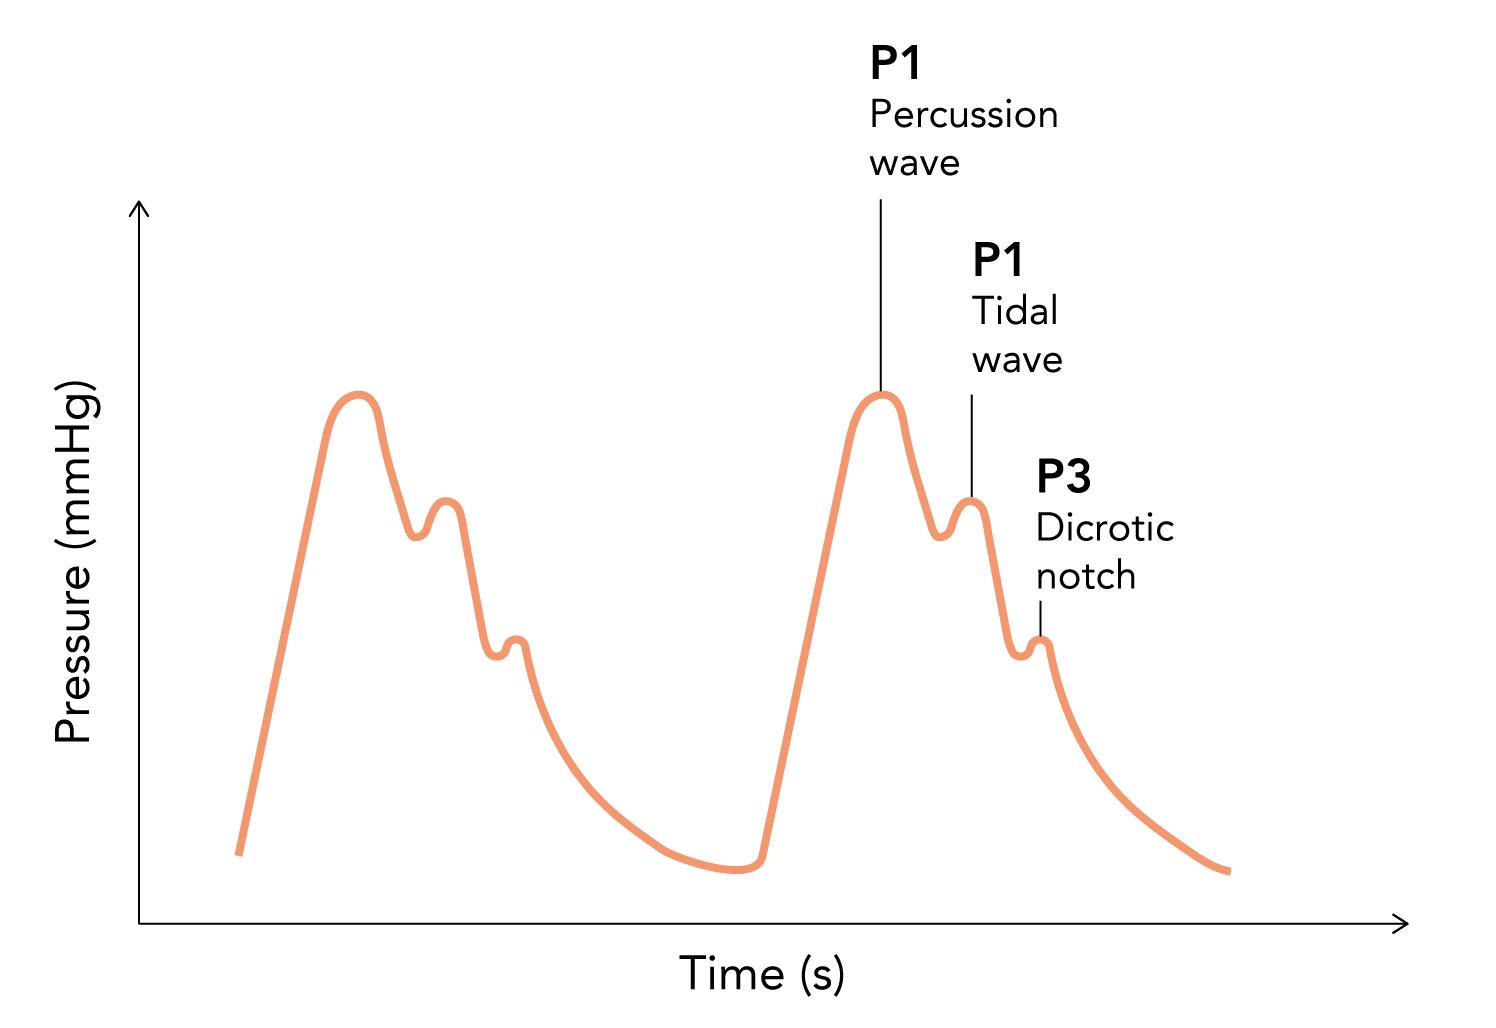 Normal intracranial pressure (ICP) waveform